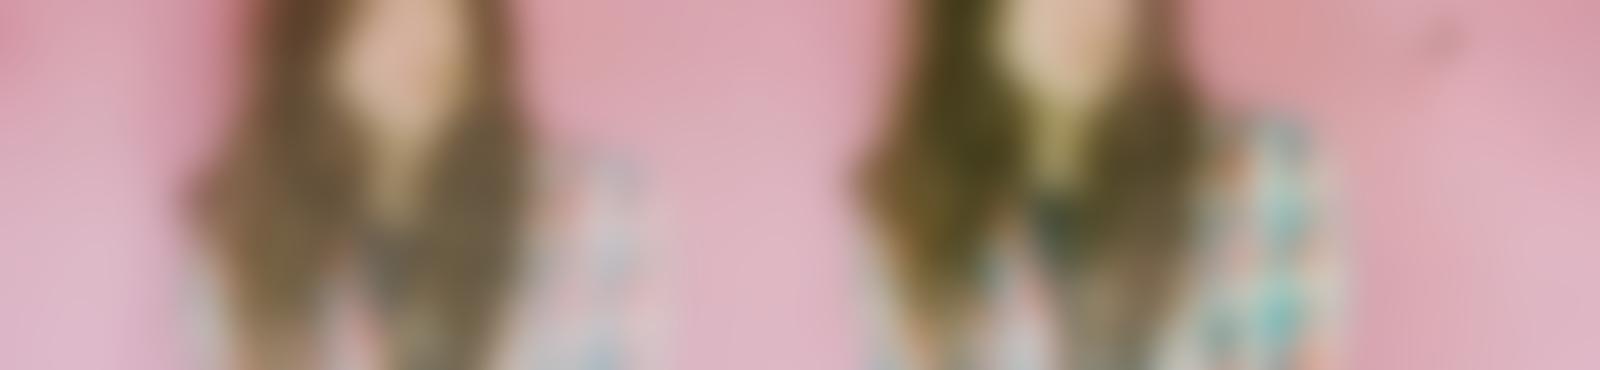 Blurred 5dbf3e31 906f 4dc8 a677 cd35e4bb4c88